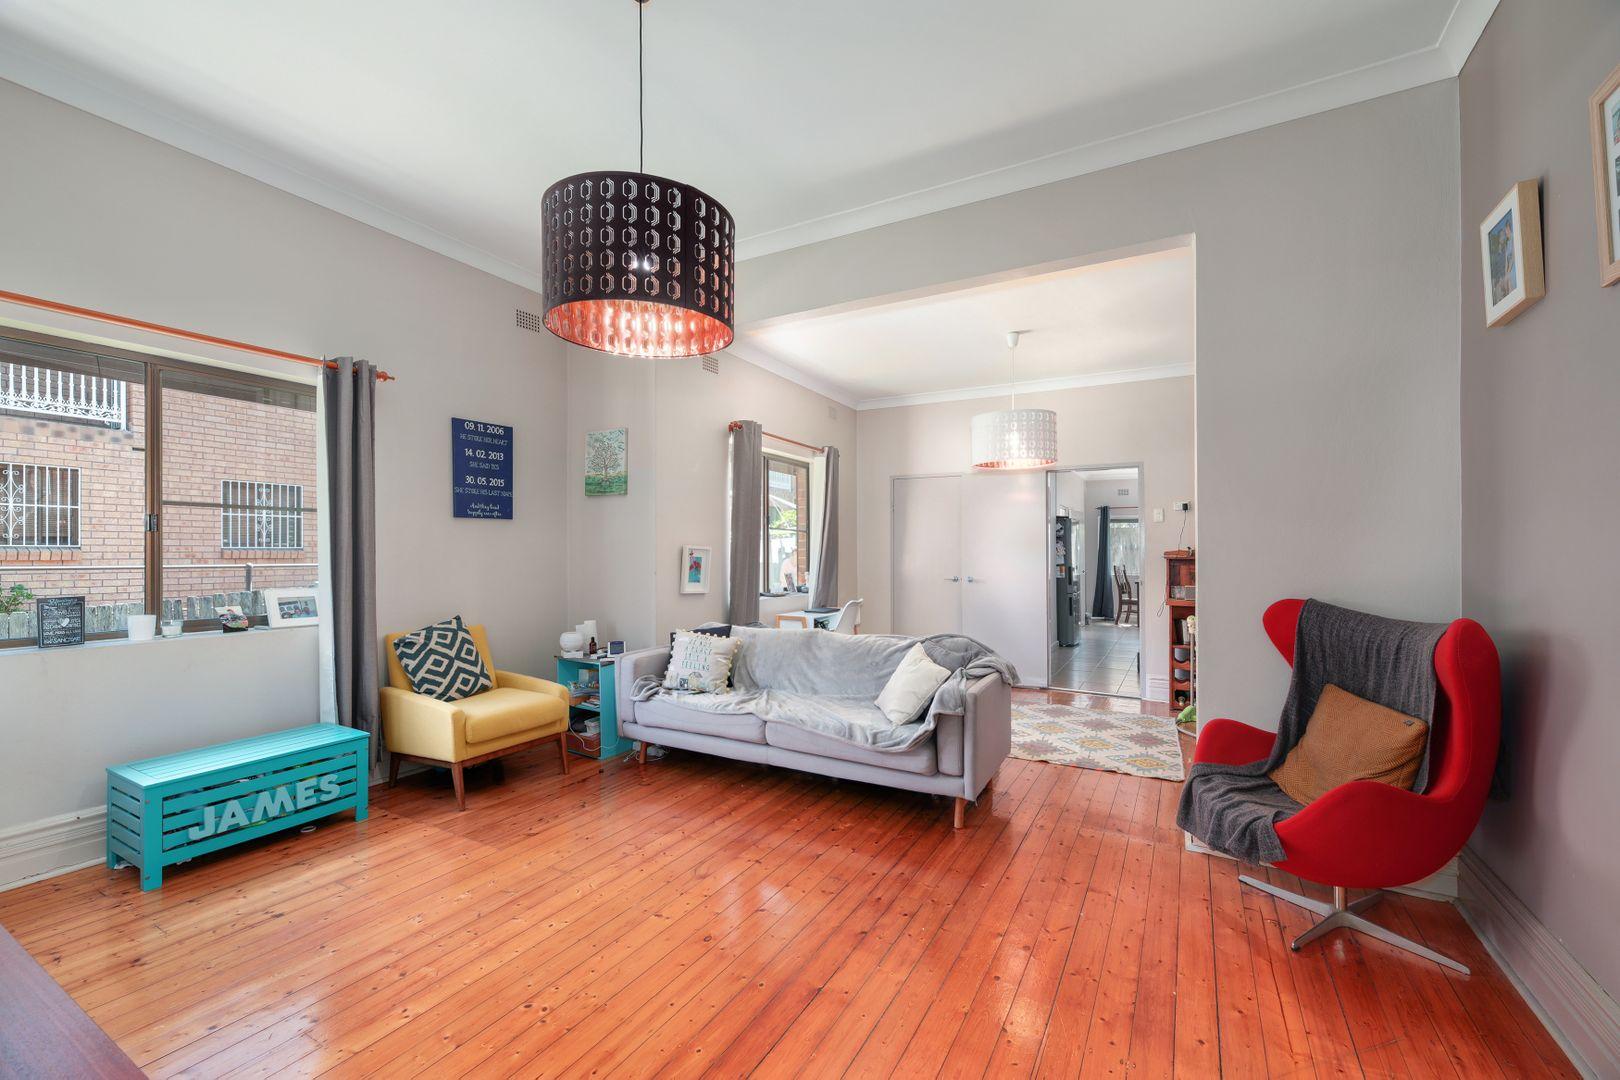 22-24 Bayswater Street, Drummoyne NSW 2047, Image 1